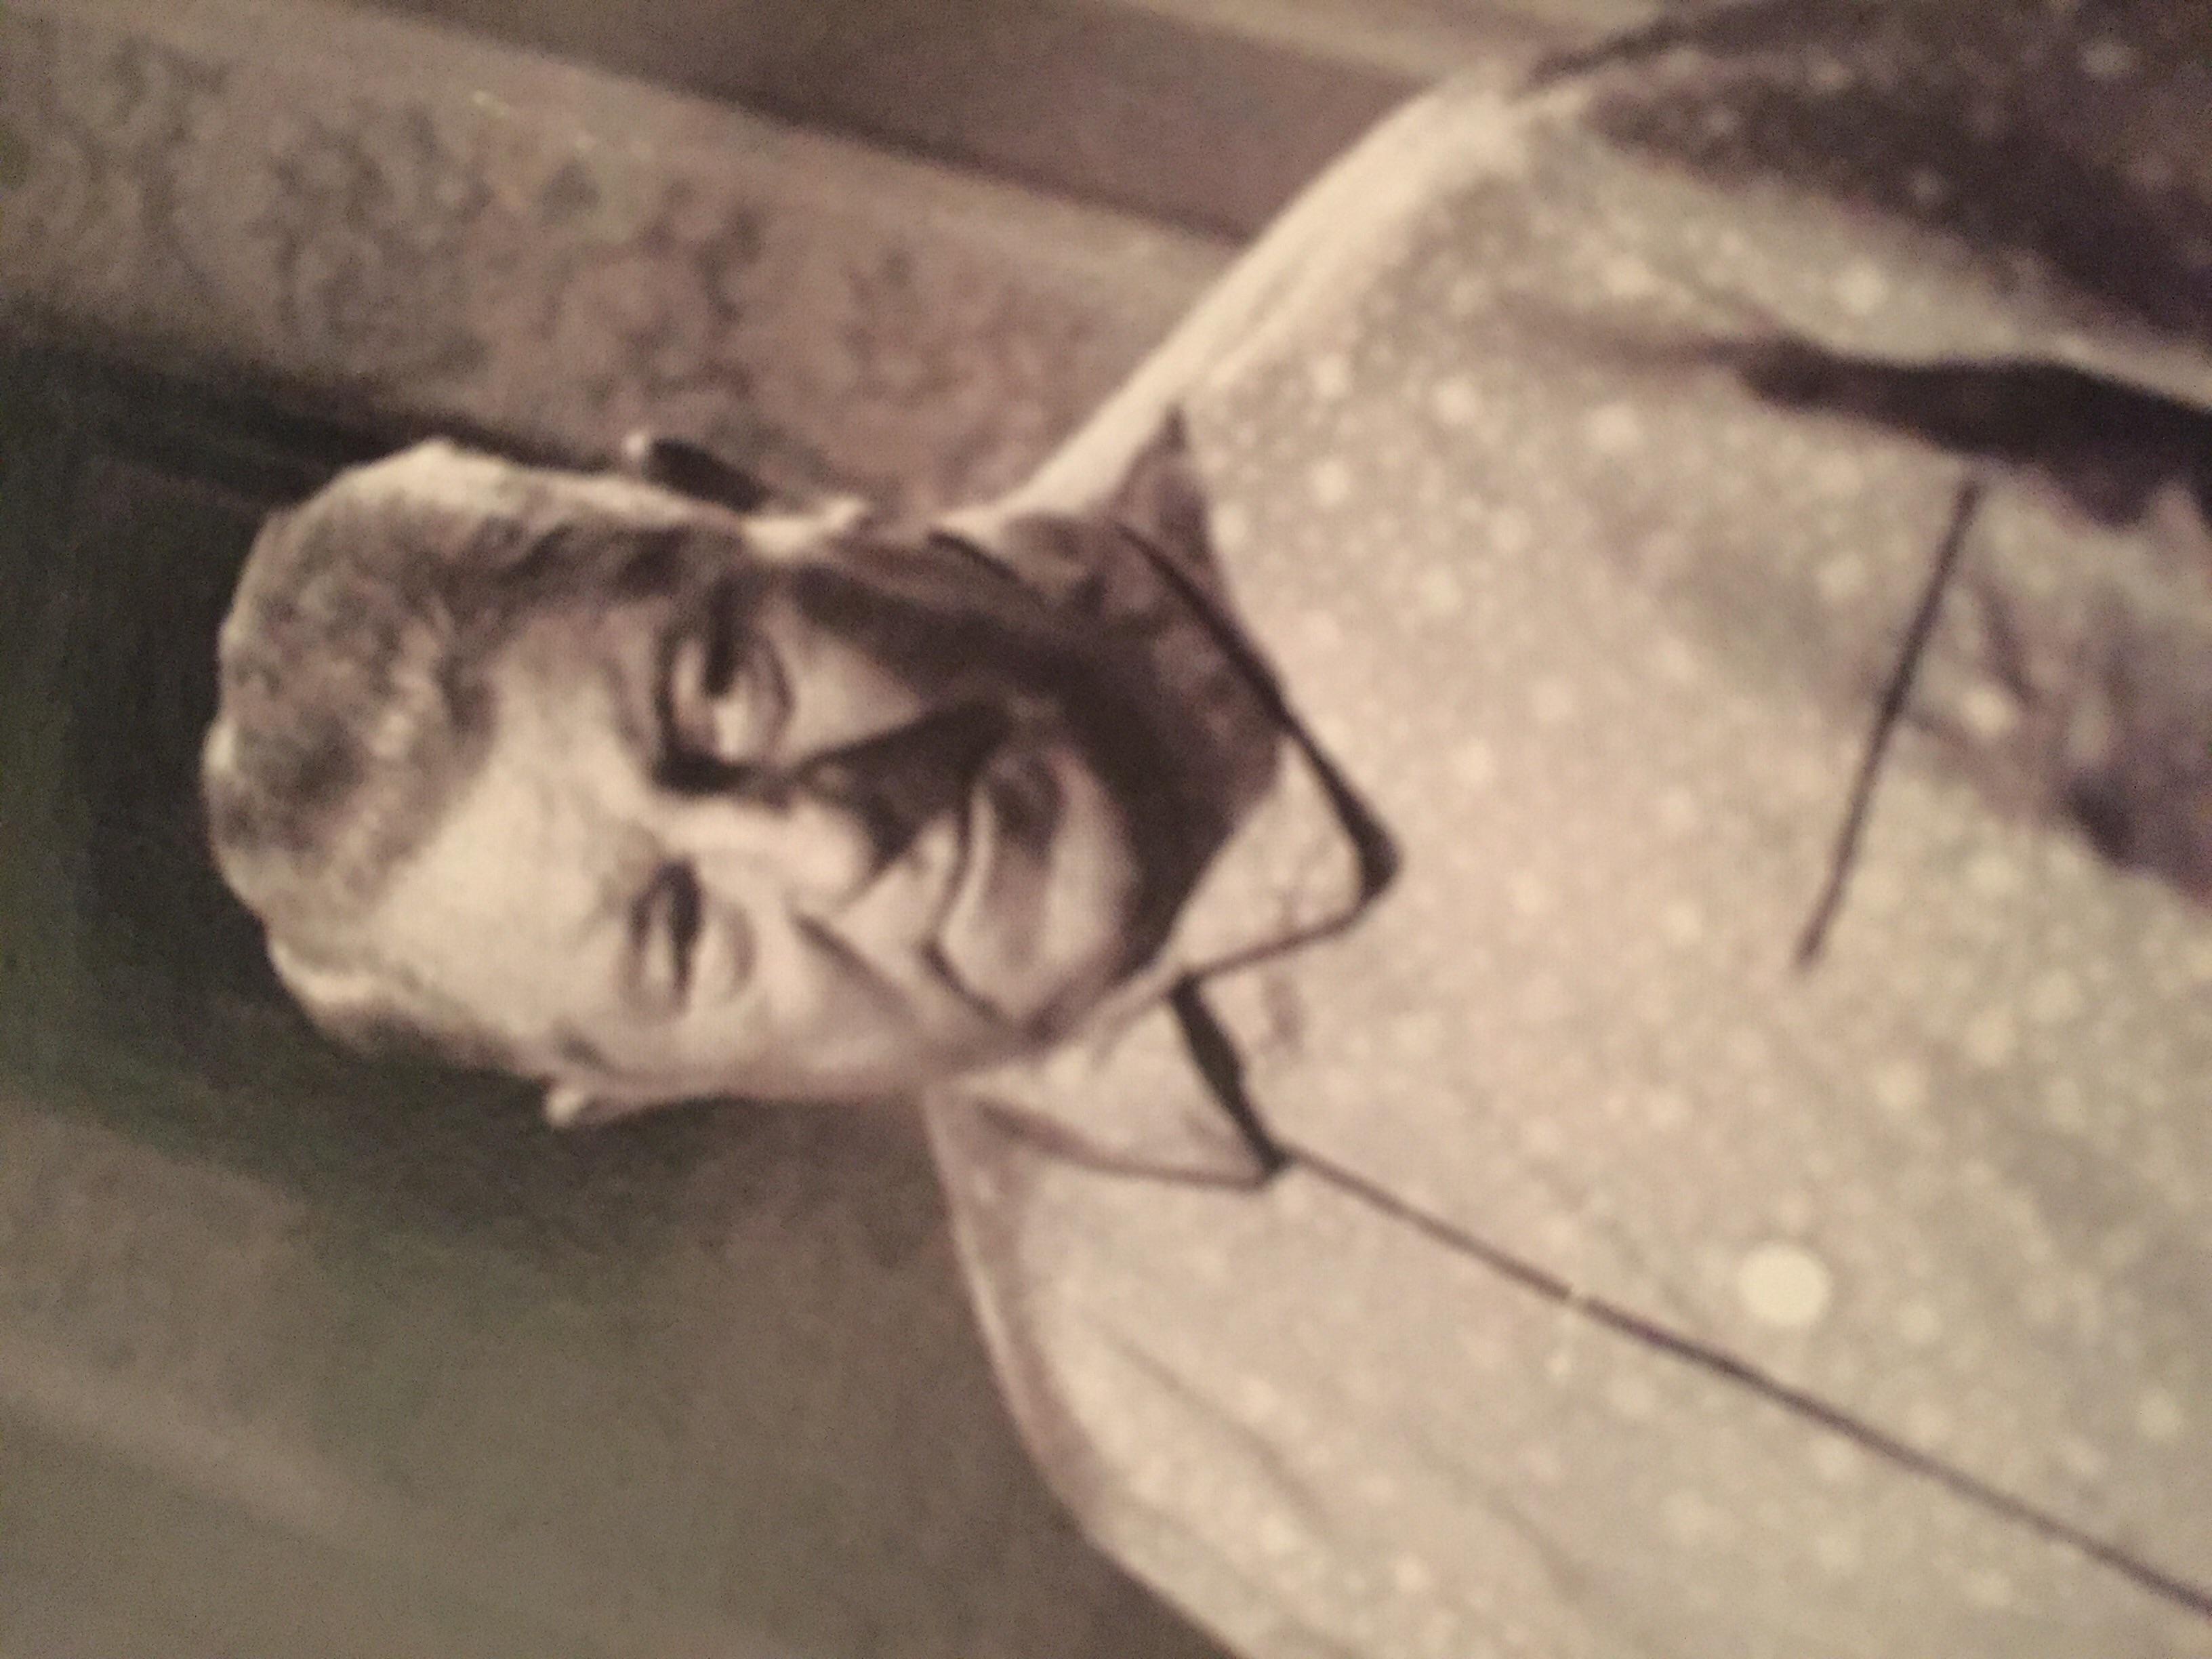 Jean Gabin Abides